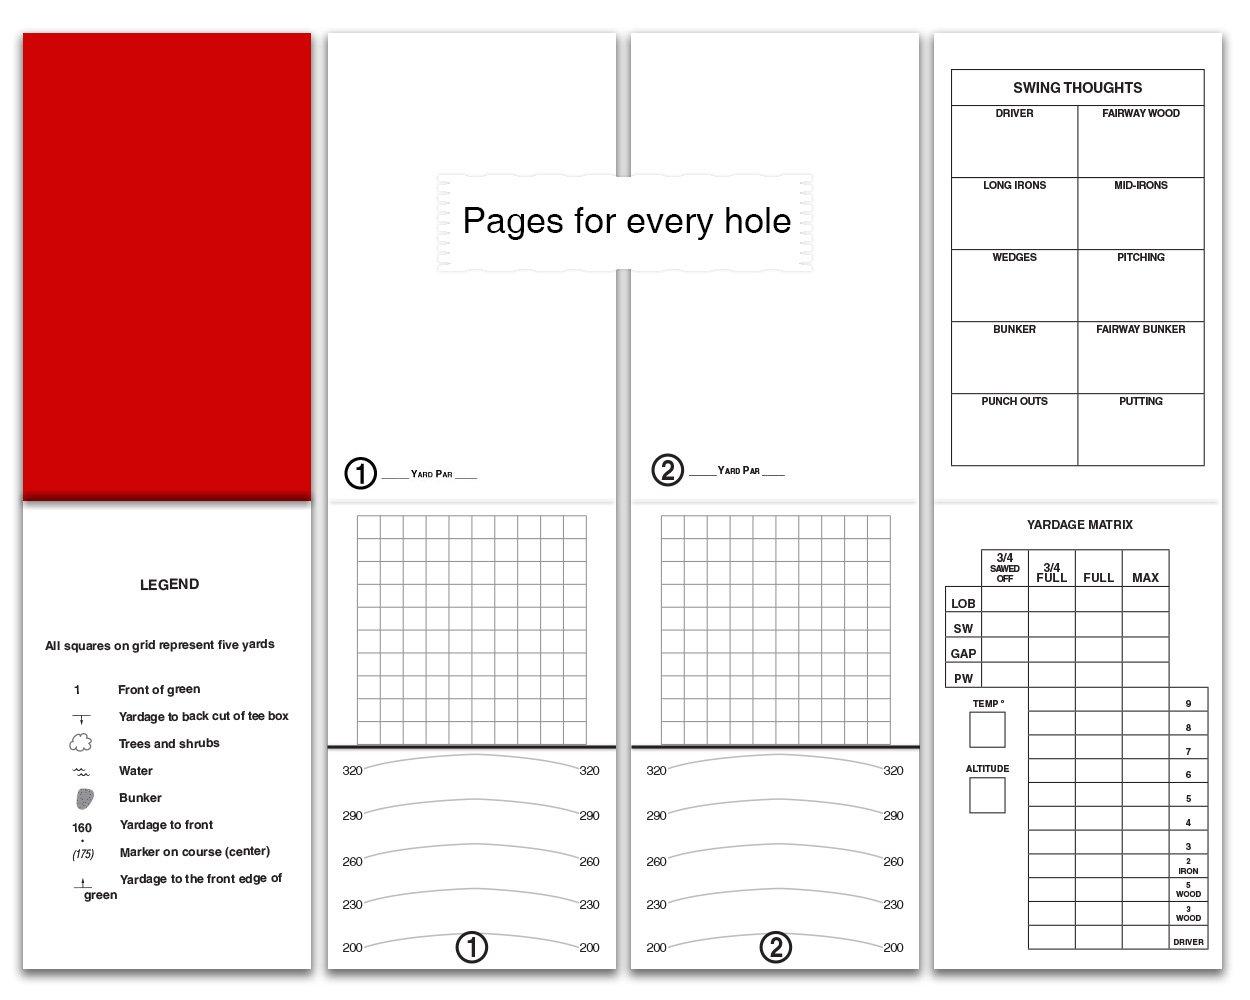 Emblemedia Golf Yardage Book (4 Pack) PGA Template 2019 USGA Conforming by Emblemedia (Image #5)